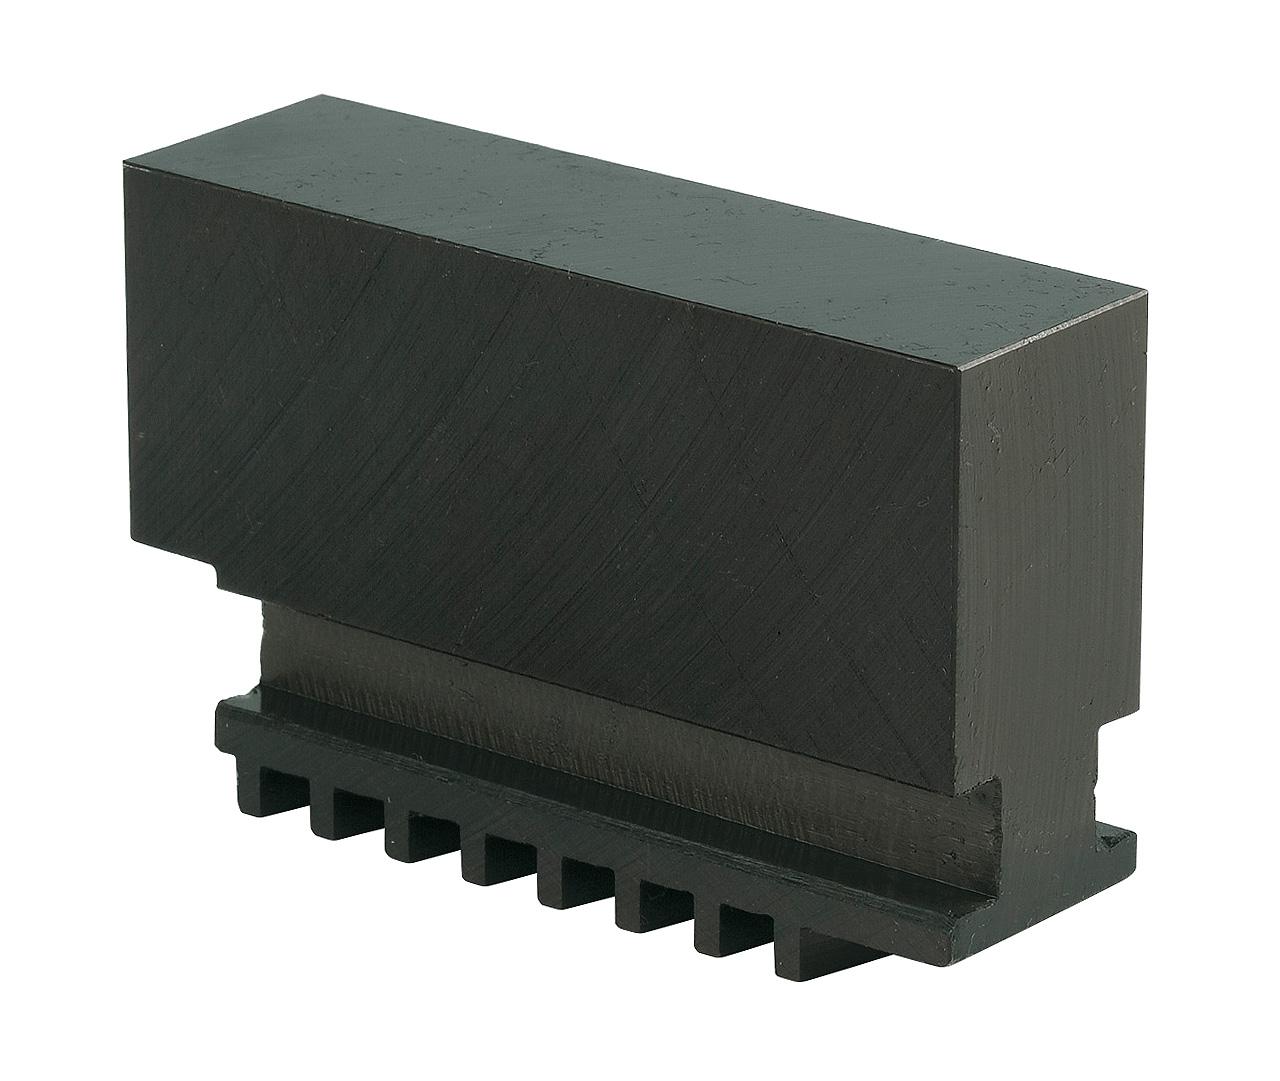 Szczęki jednolite miękkie - komplet DSJ-DK12-125 BERNARDO